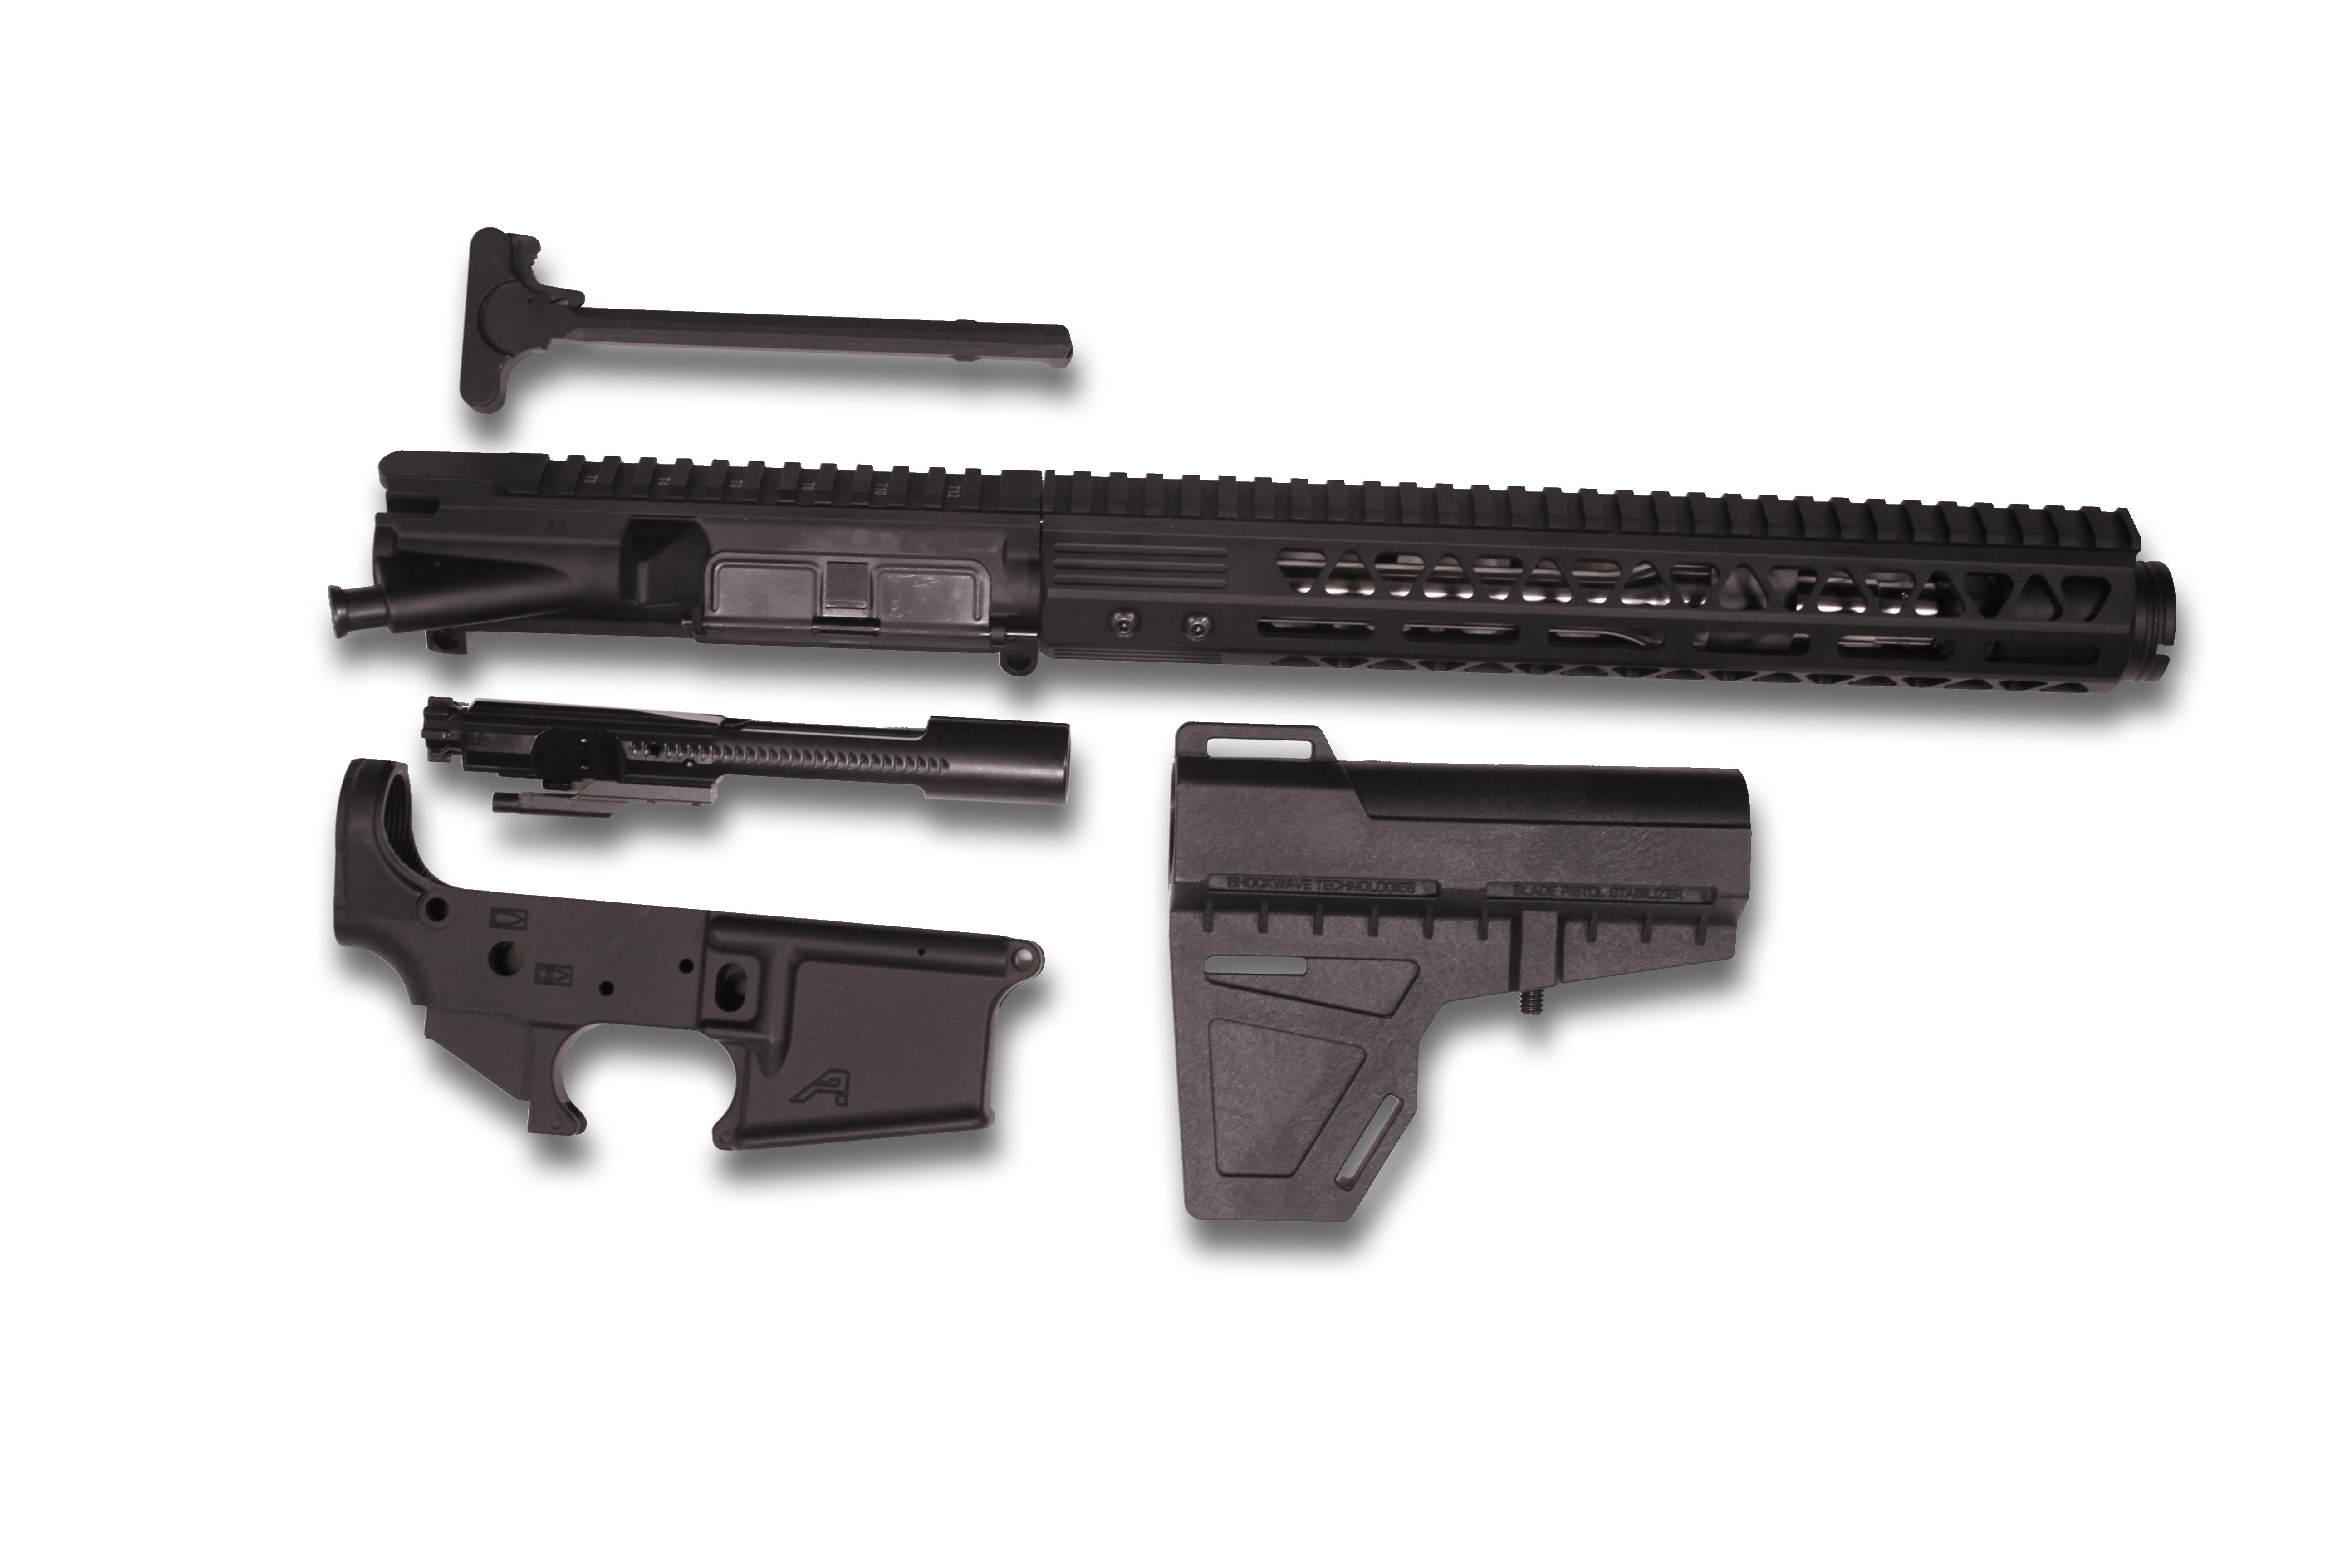 AR15 Pistol Build Kit